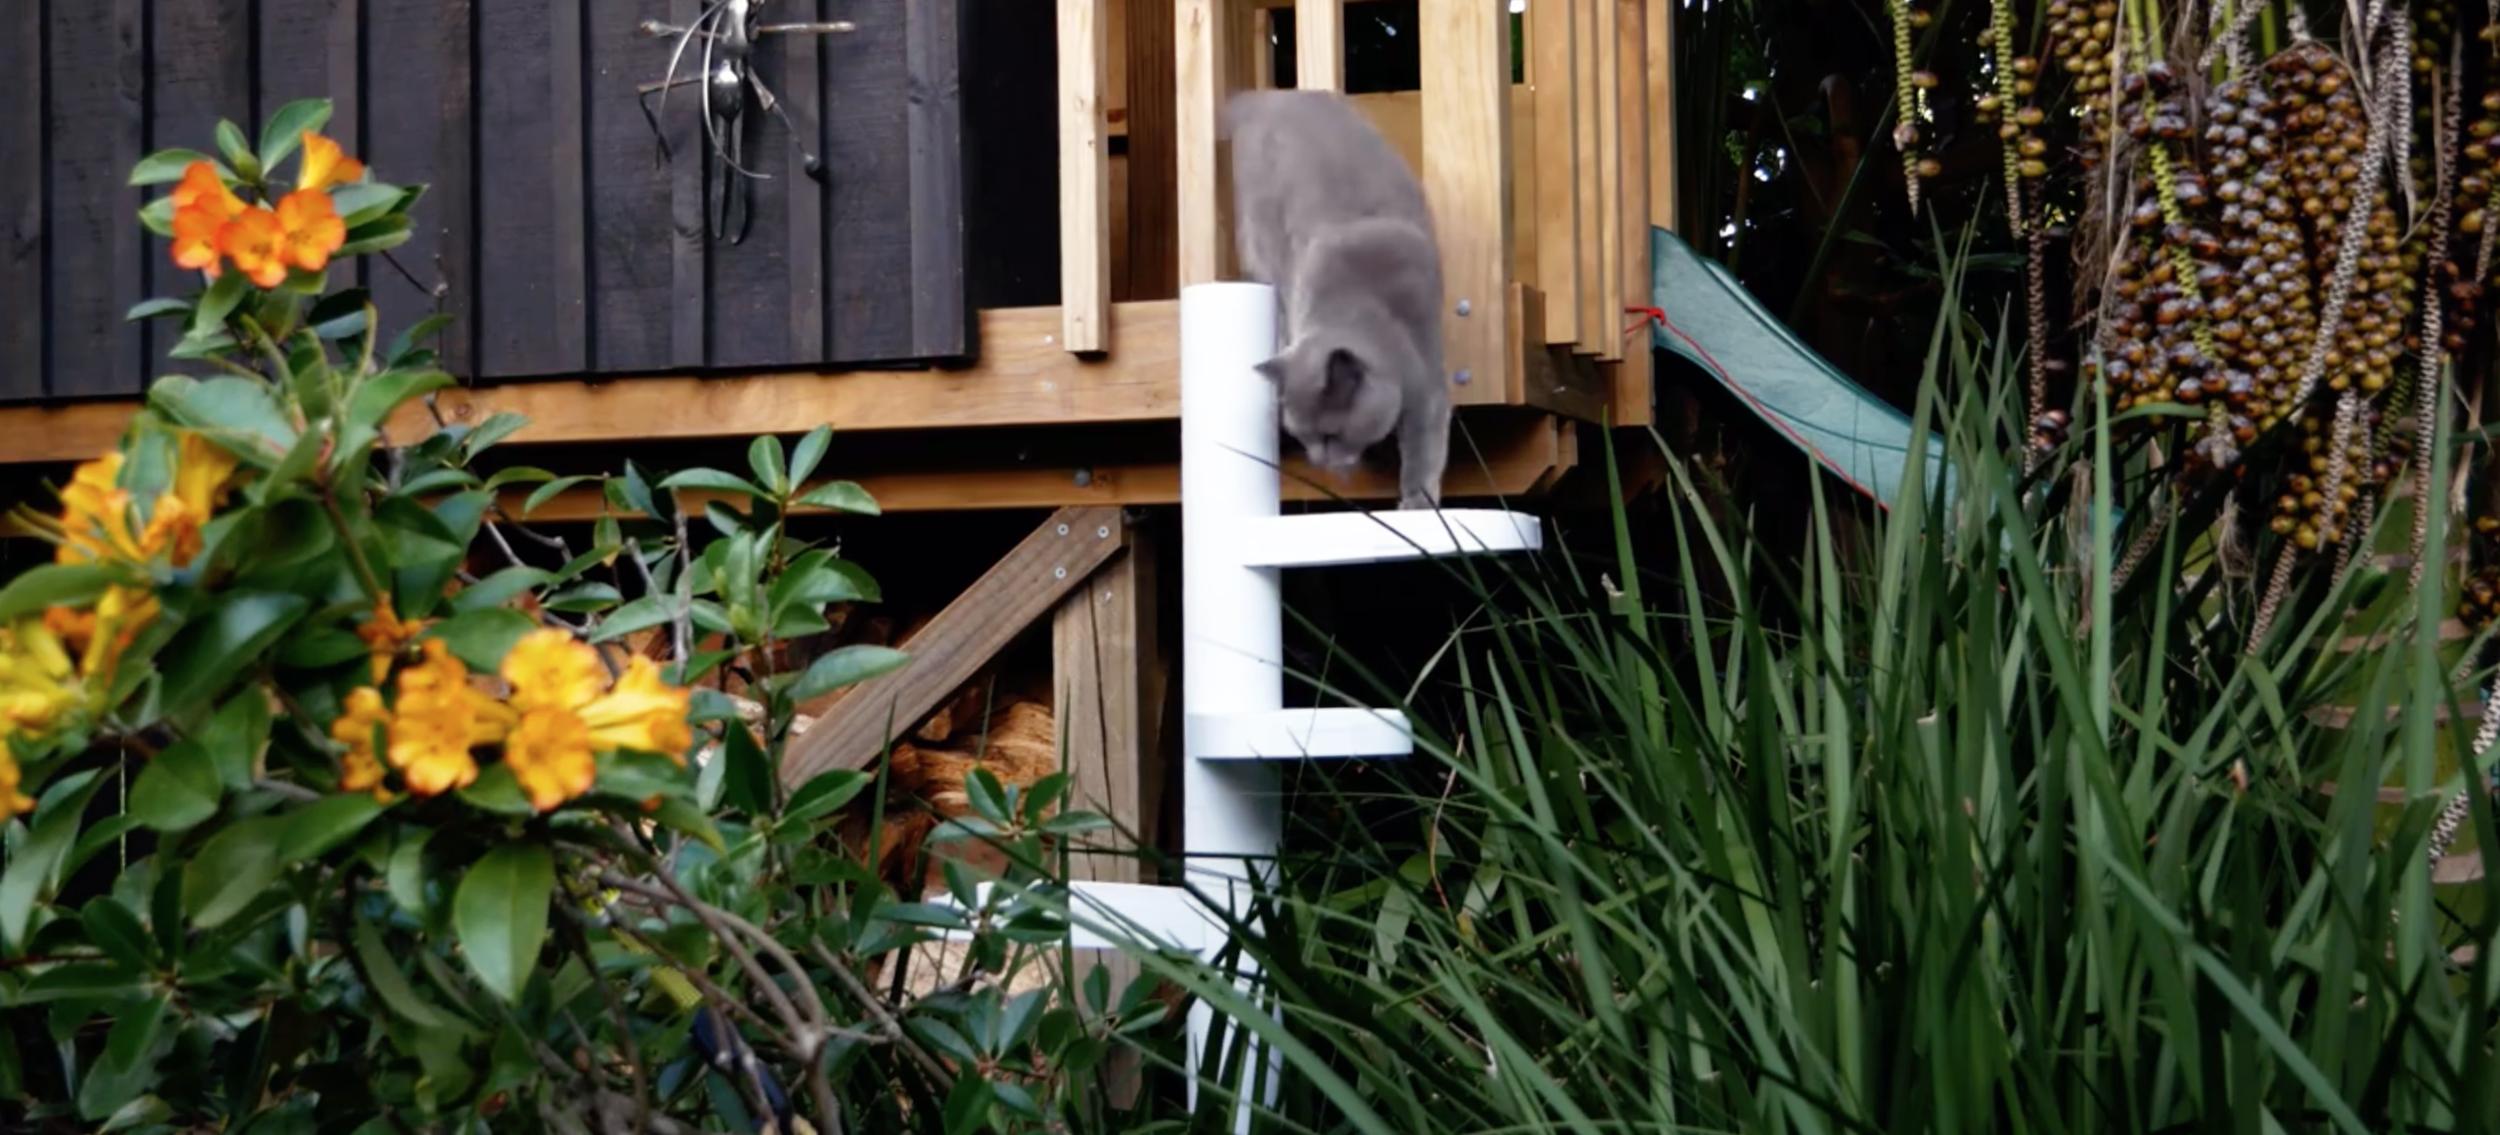 Globex-engineering-product-design-consultancy-MonkeeTree-Cat